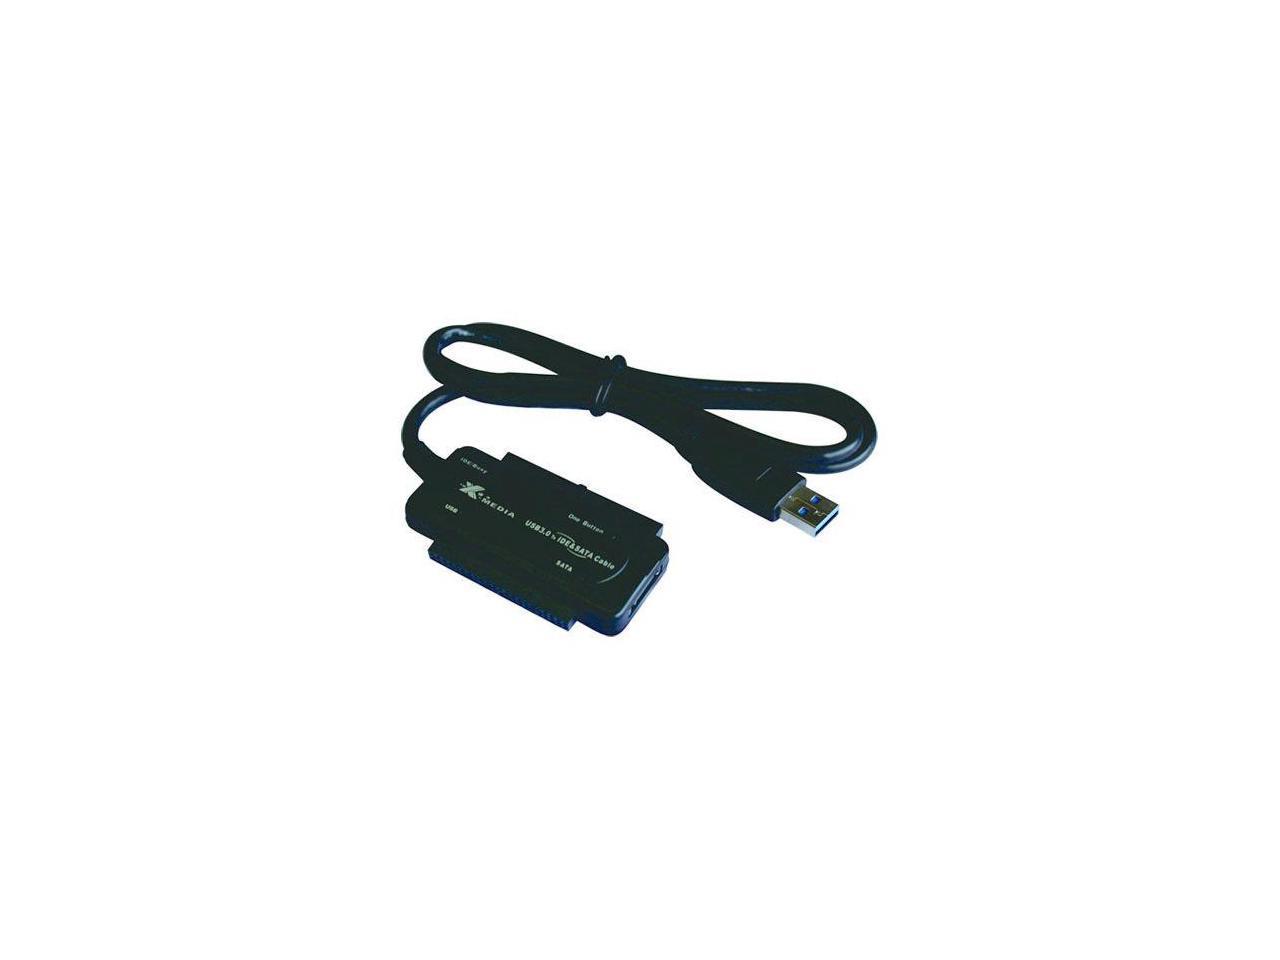 Premiertek X-Media SATA+IDE 2.5/3.5 to USB 3.0 Adapter